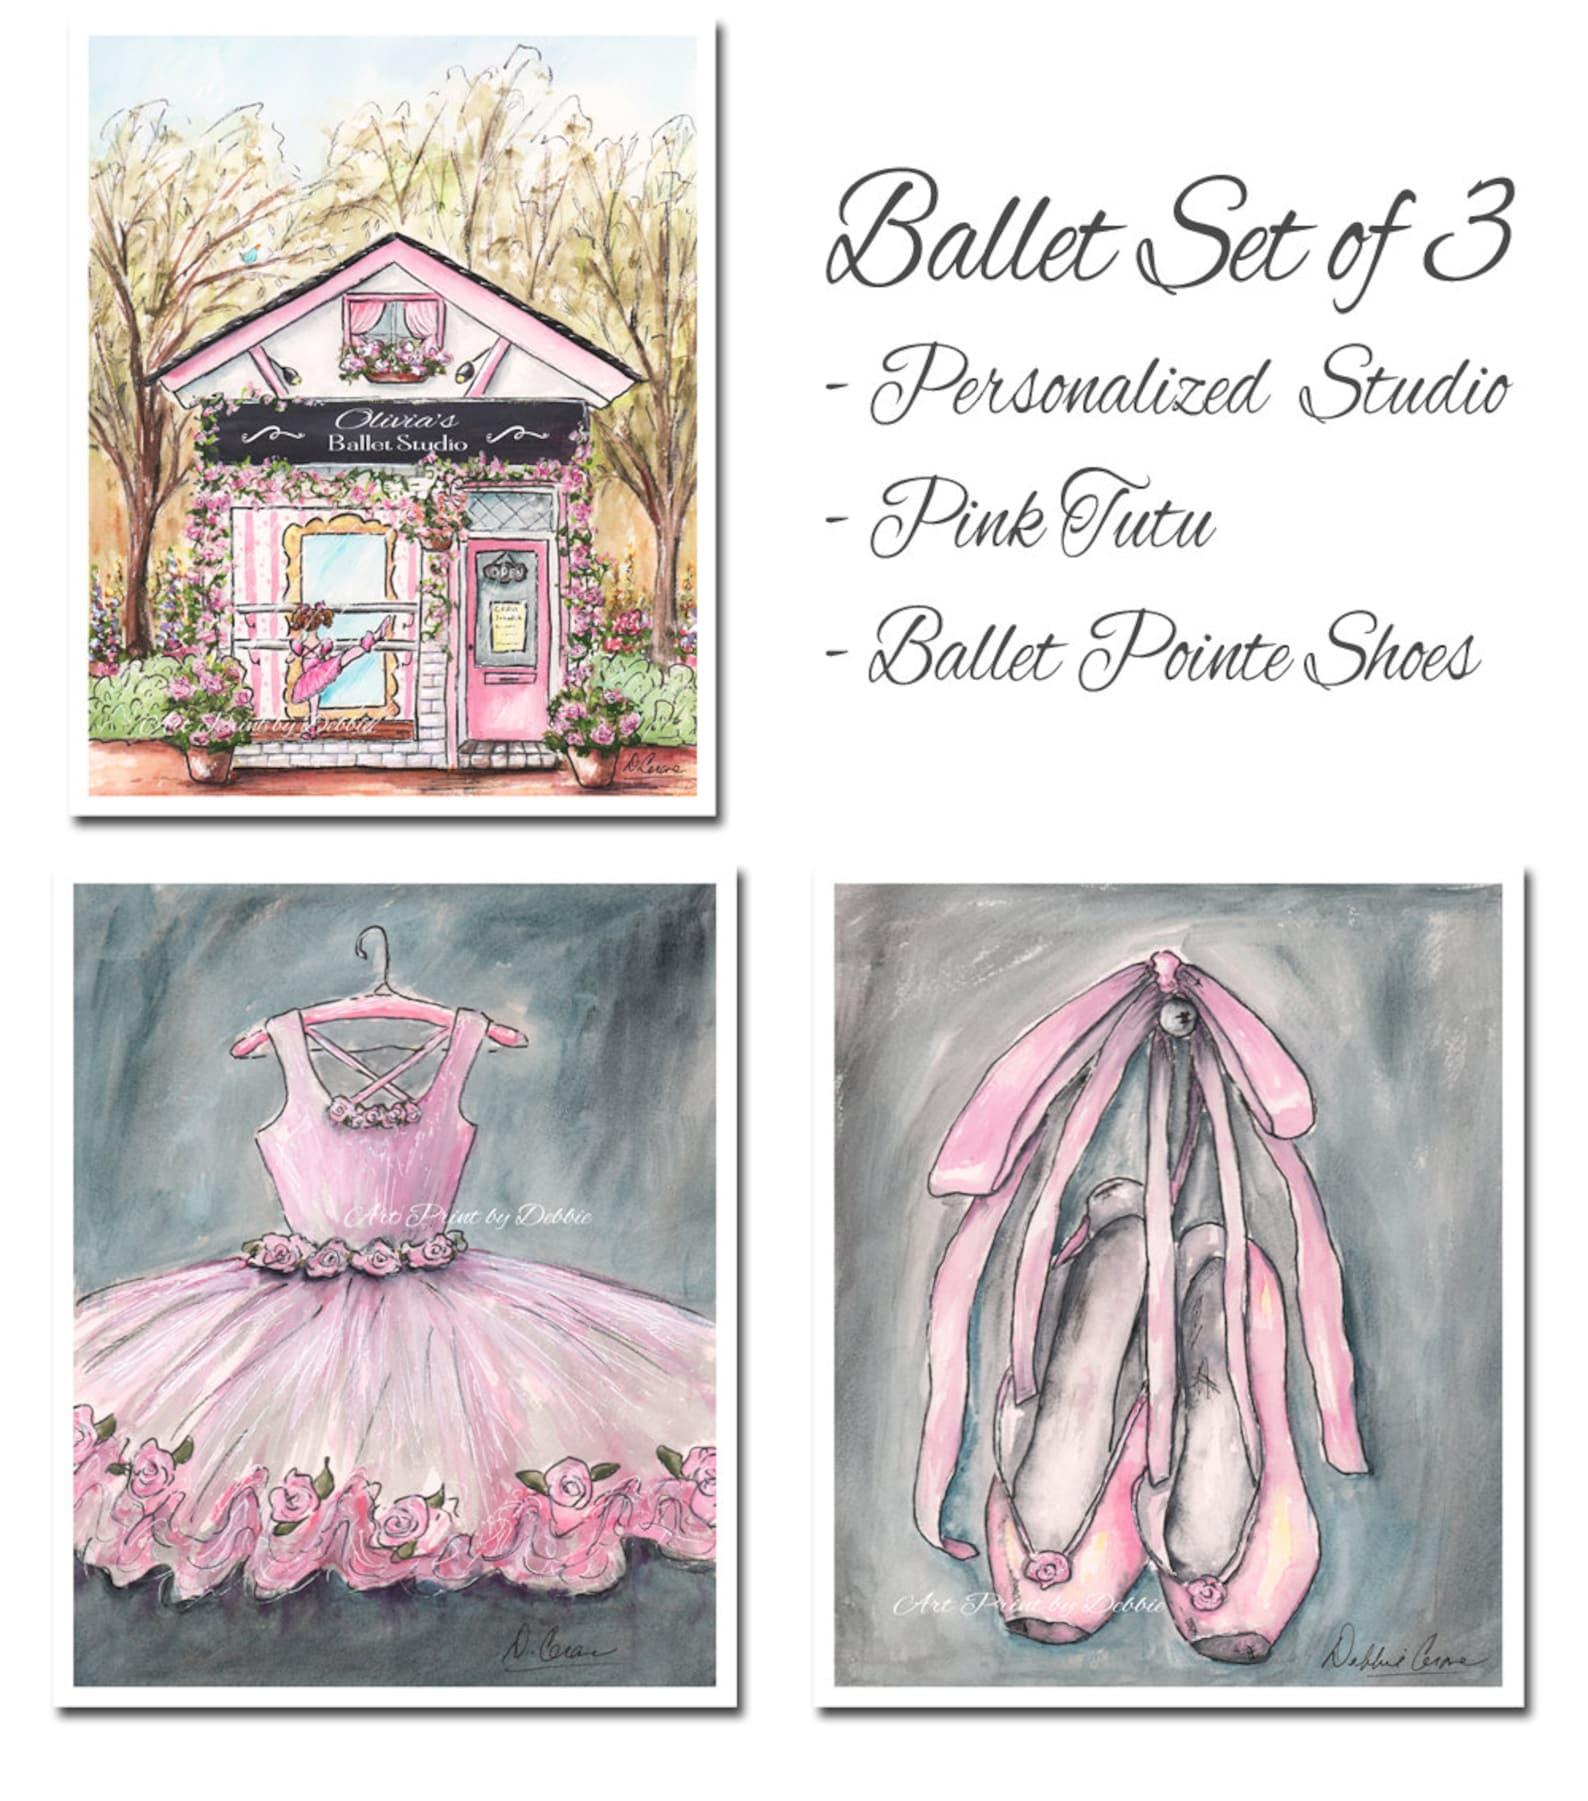 pink ballerina decor, ballet pointe shoes, pink ballet slippers, ballerina art, dancer, ballerina watercolor print, unframed fin